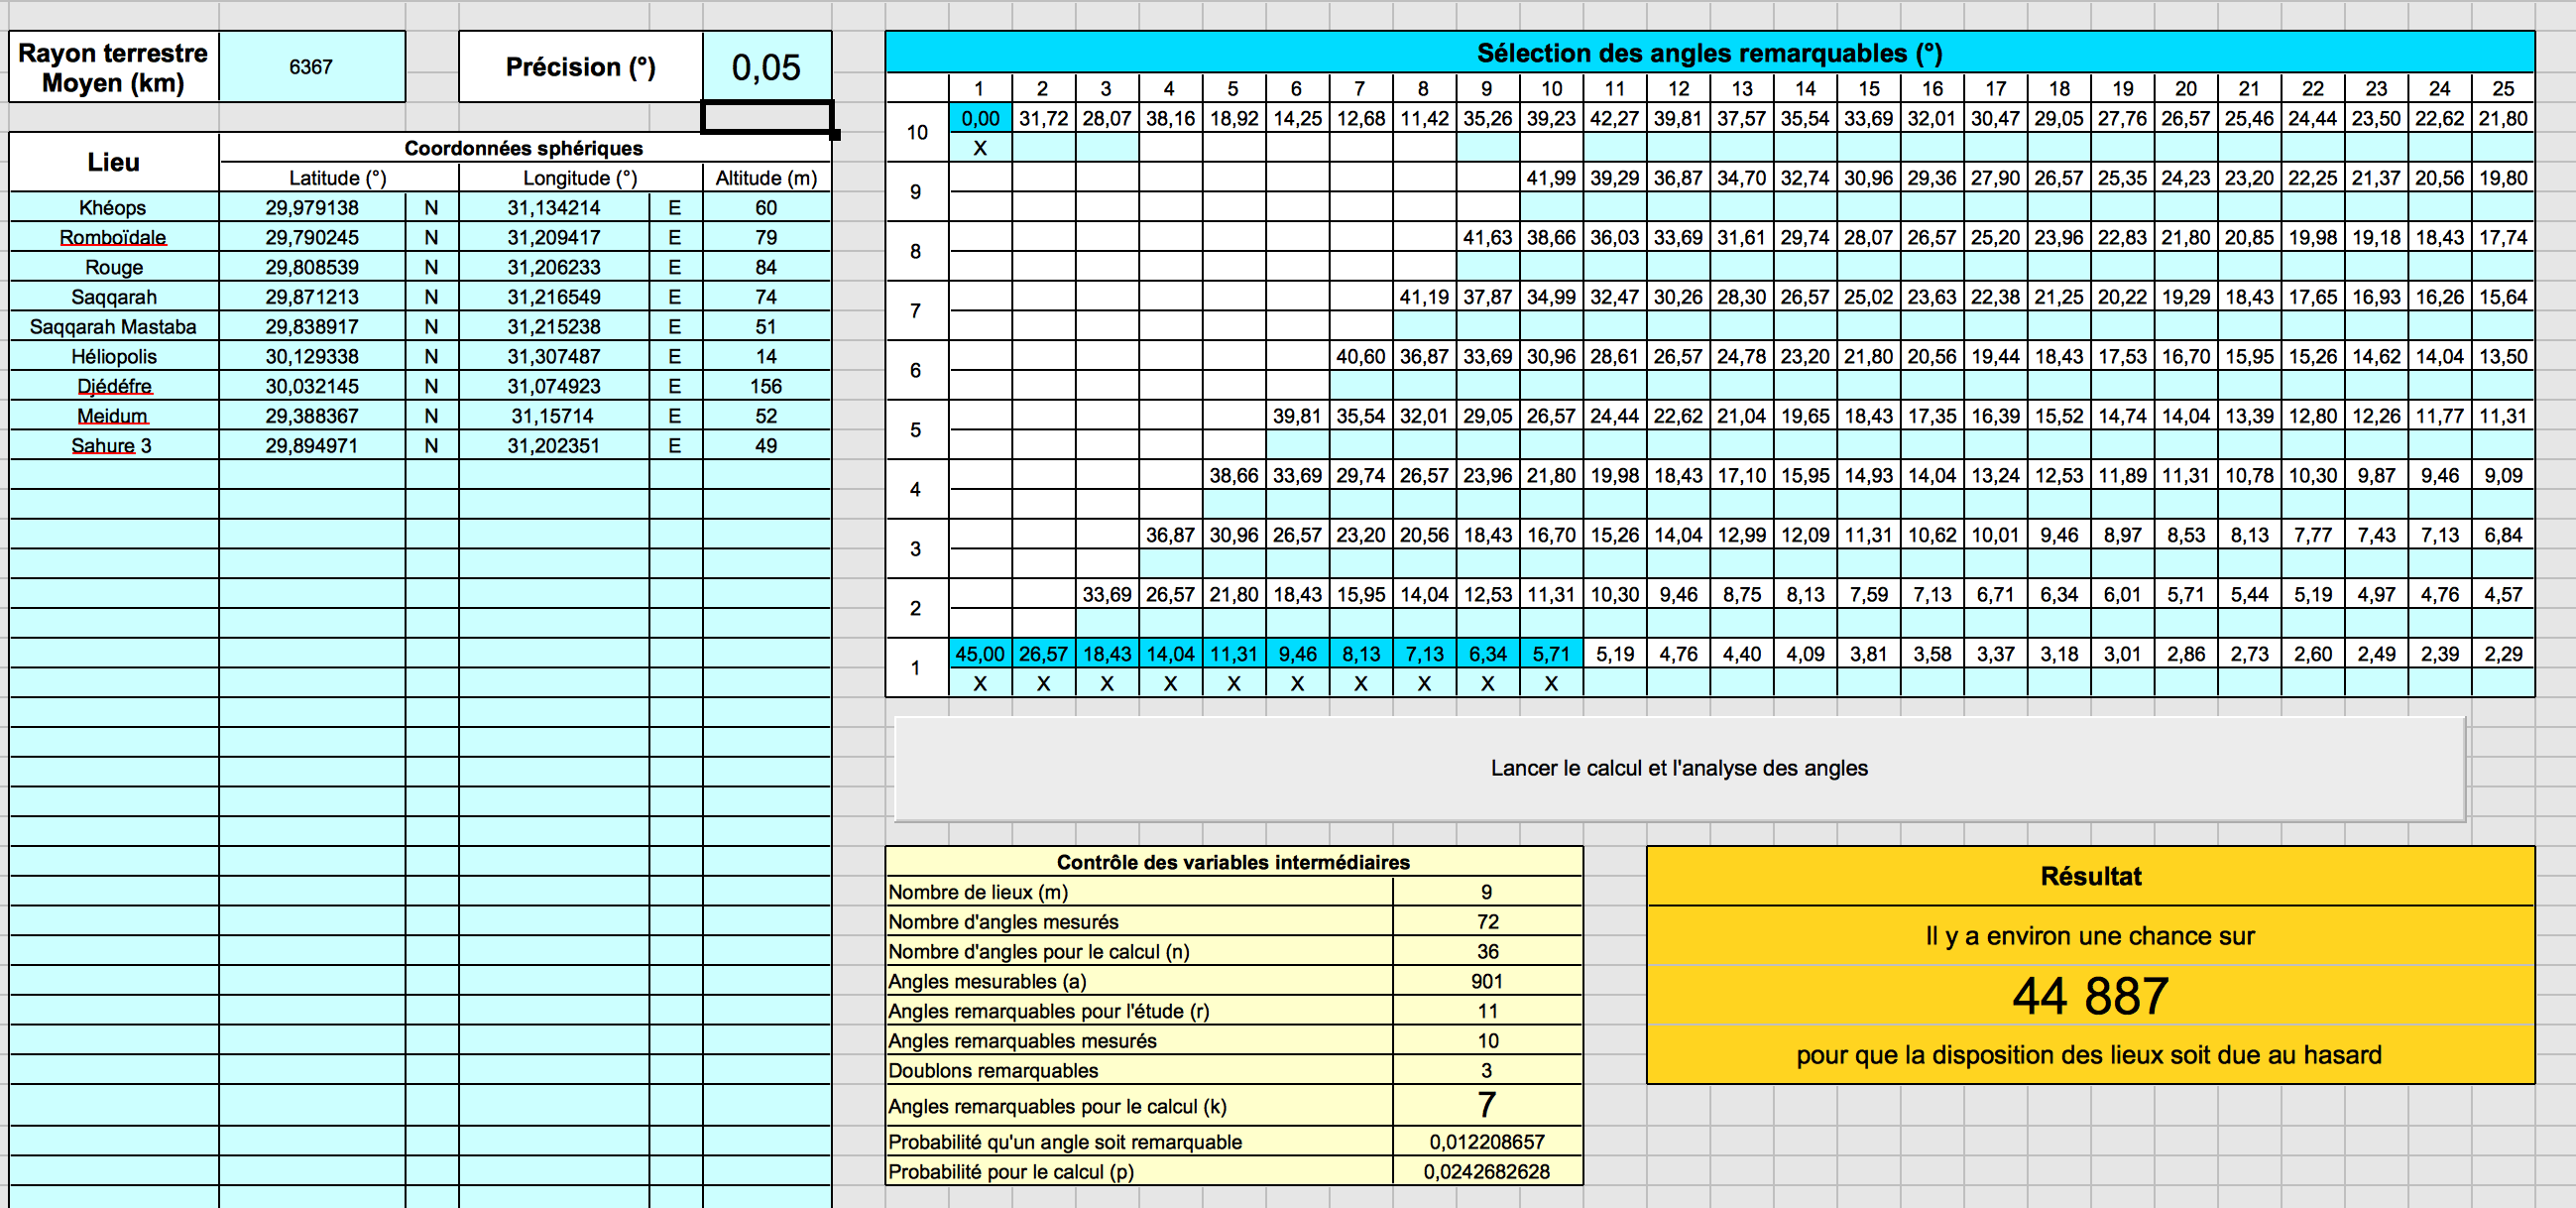 2017-11-16 10:40:56